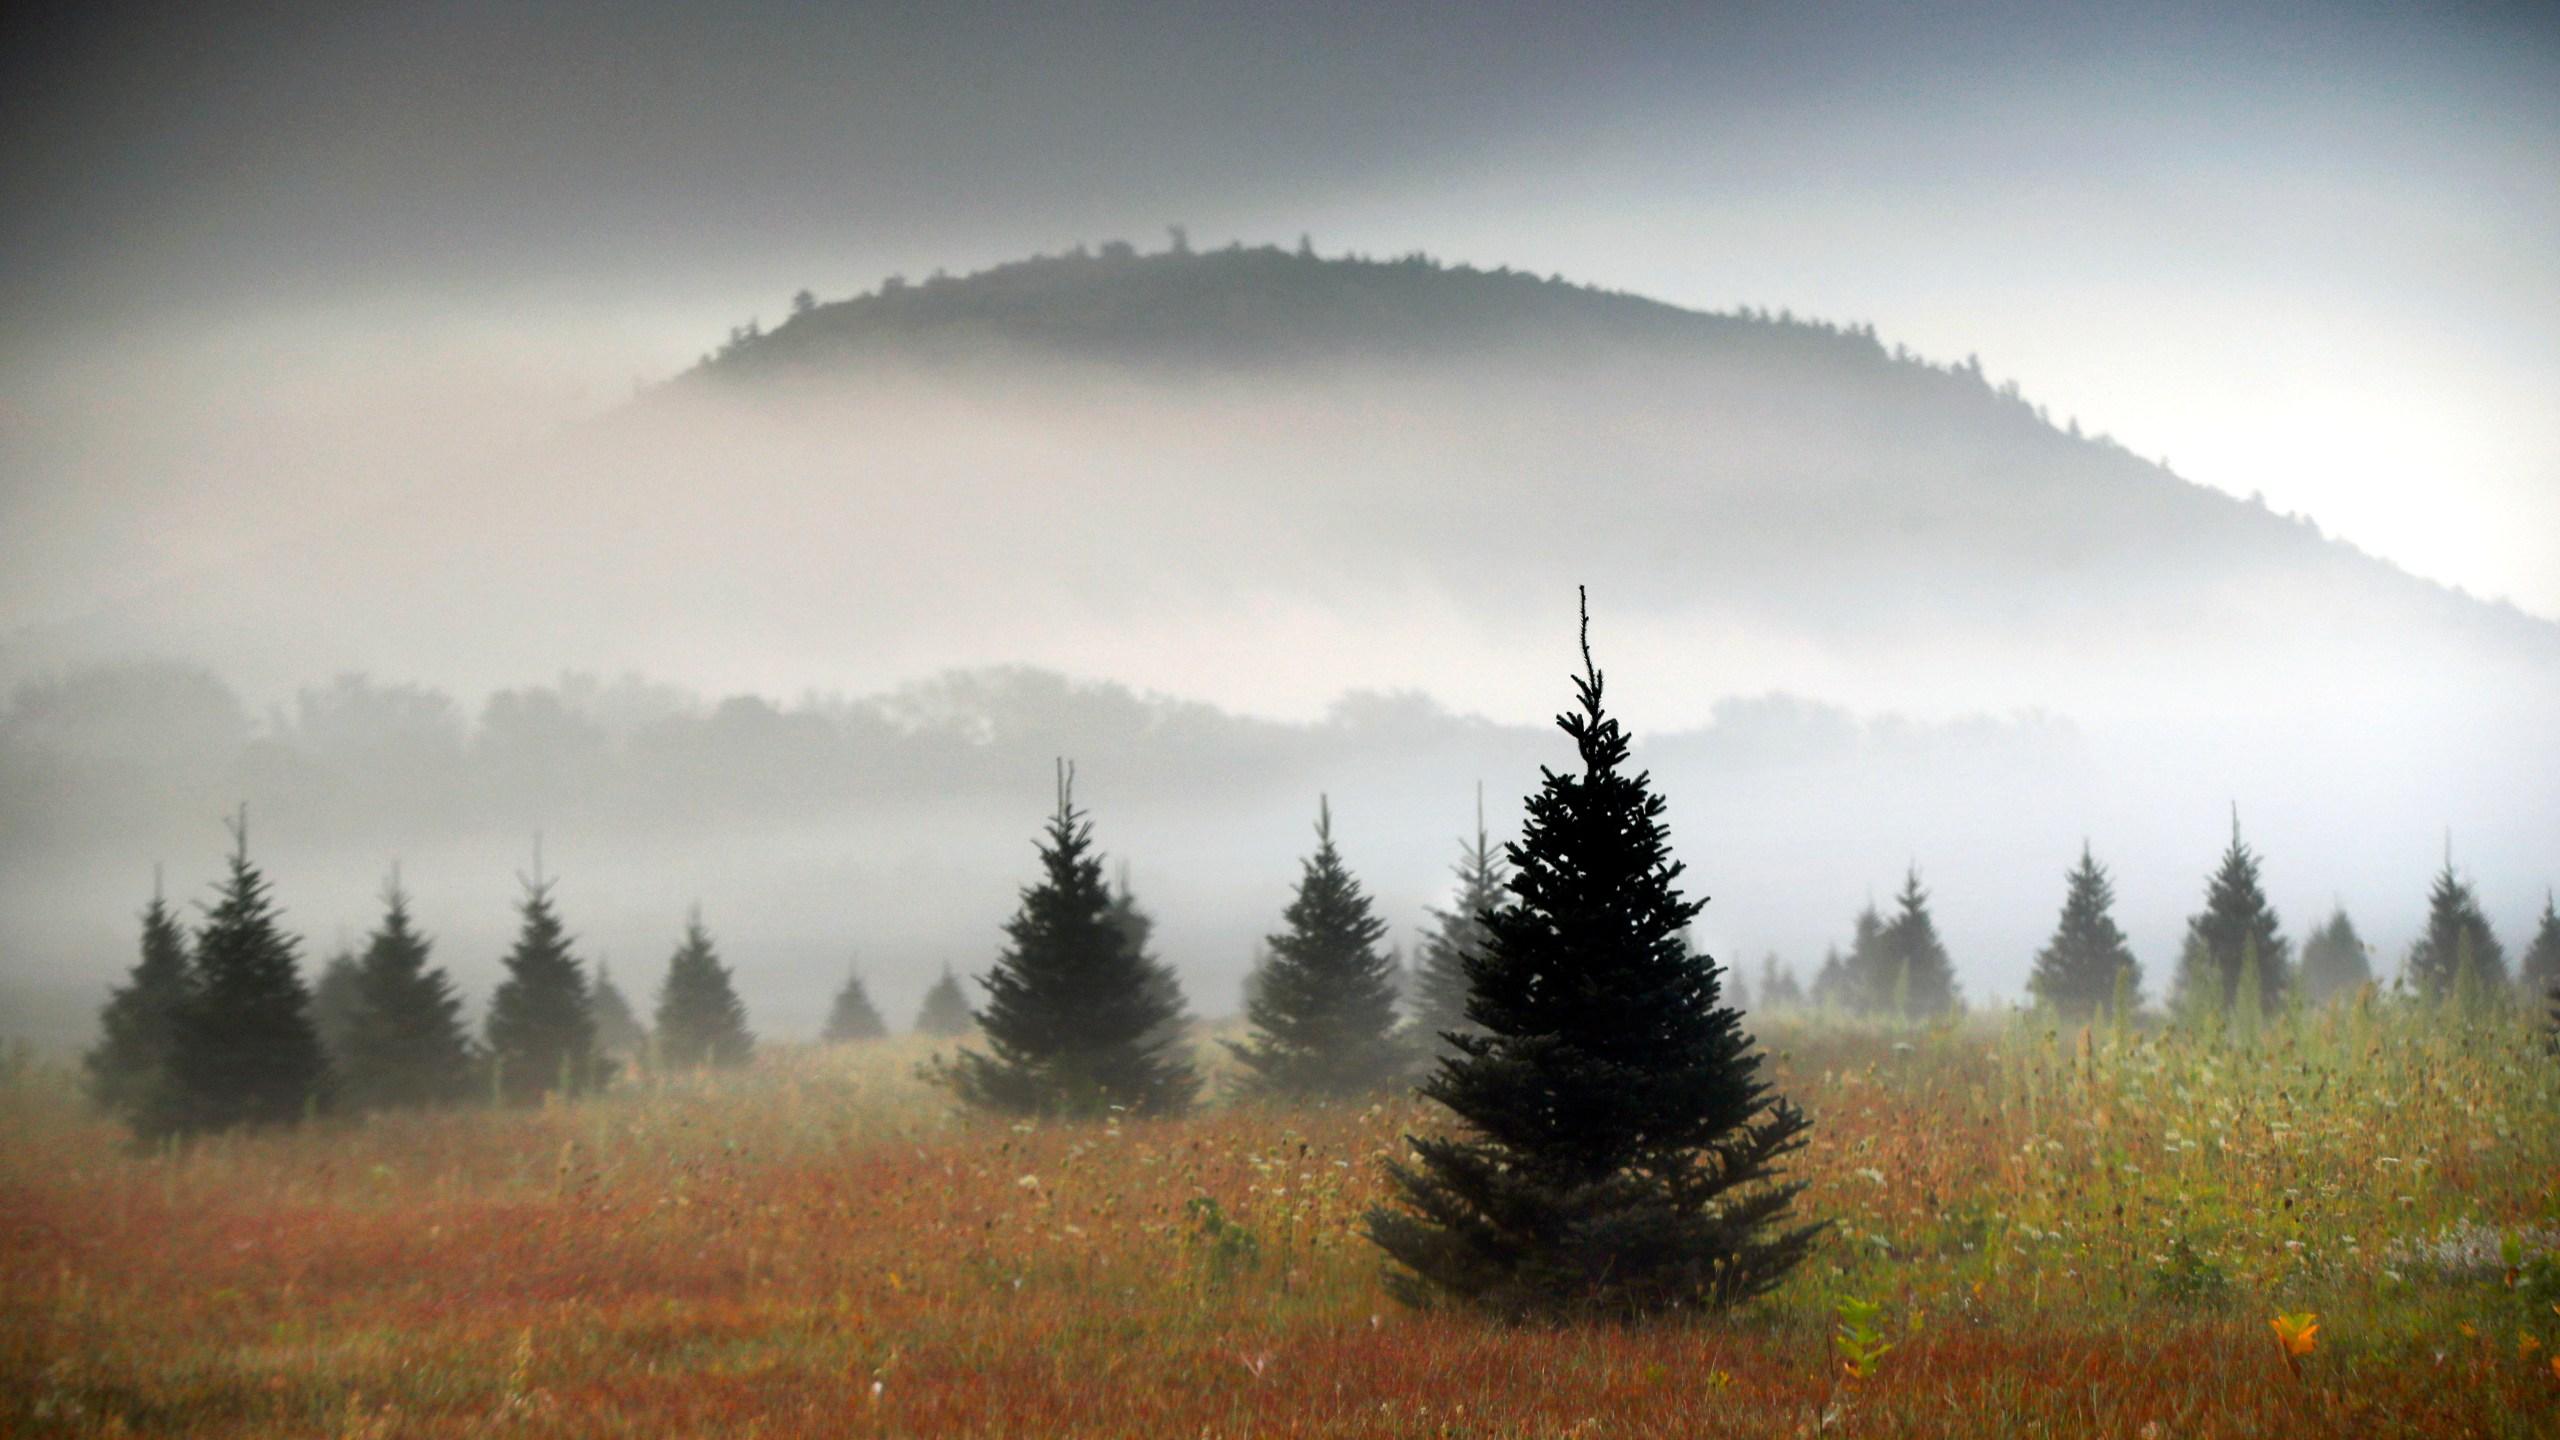 Amazon_Christmas_Trees_83450-159532.jpg15222750